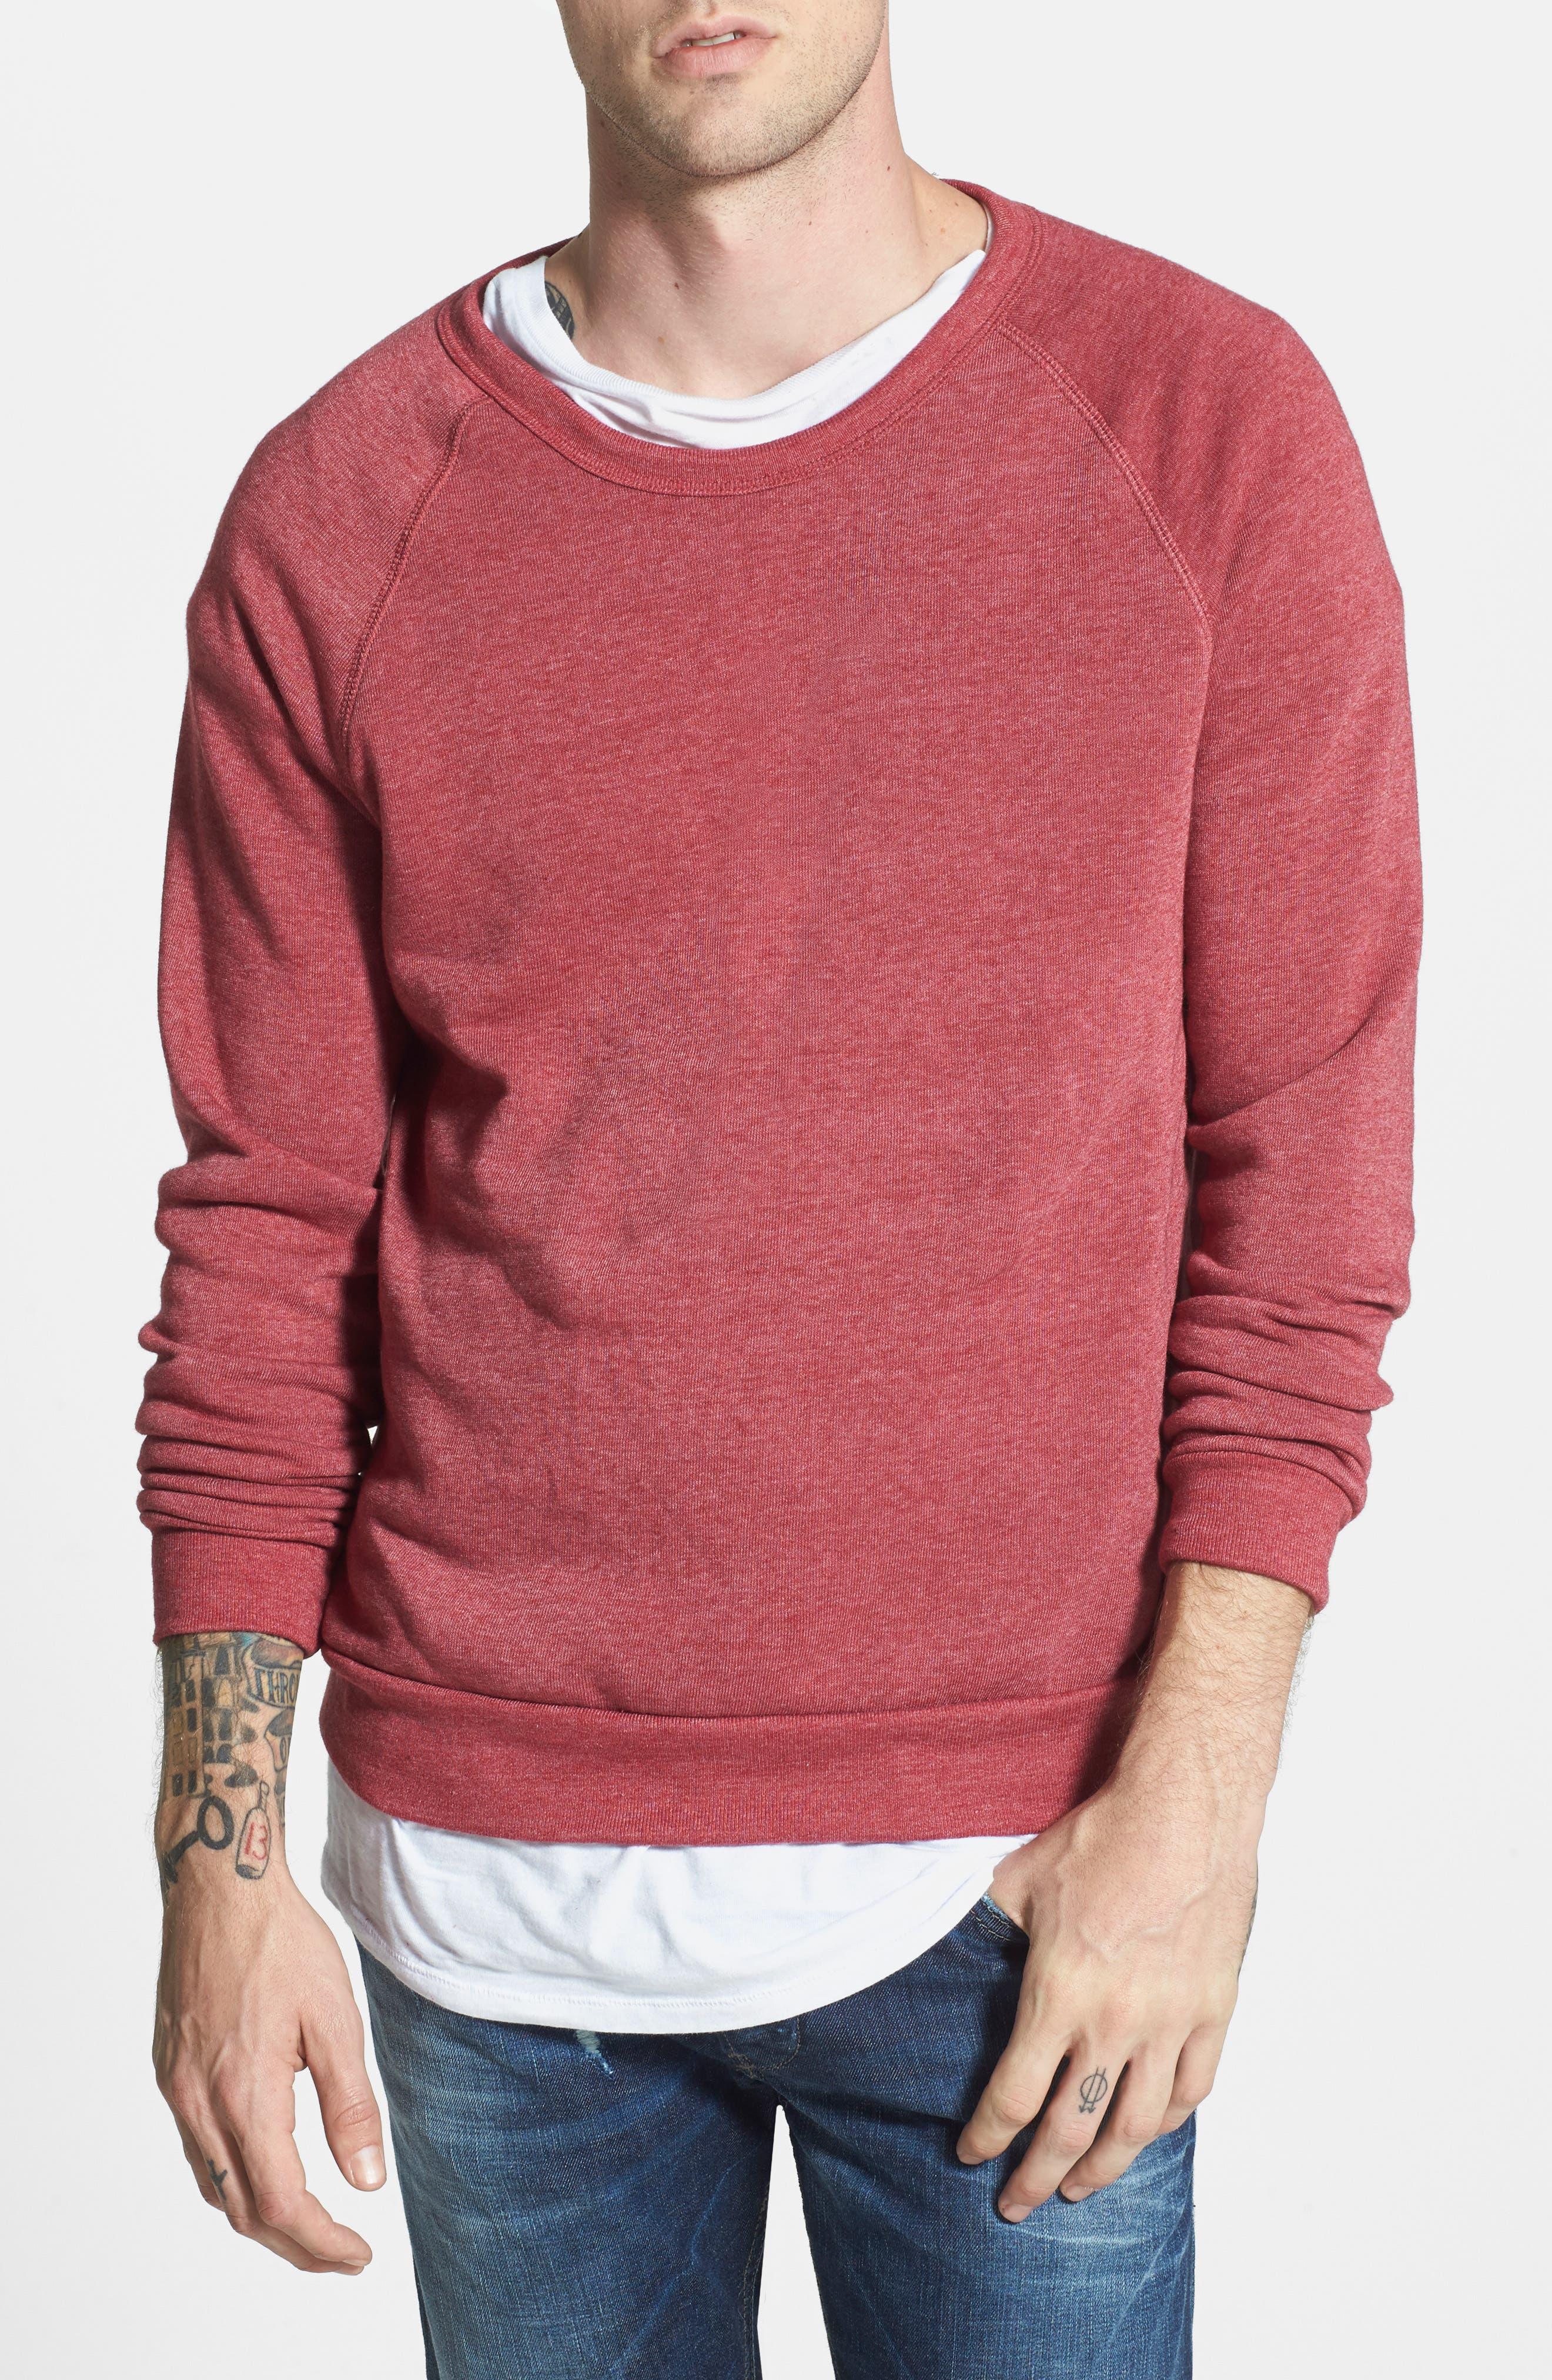 'The Champ' Sweatshirt,                             Alternate thumbnail 39, color,